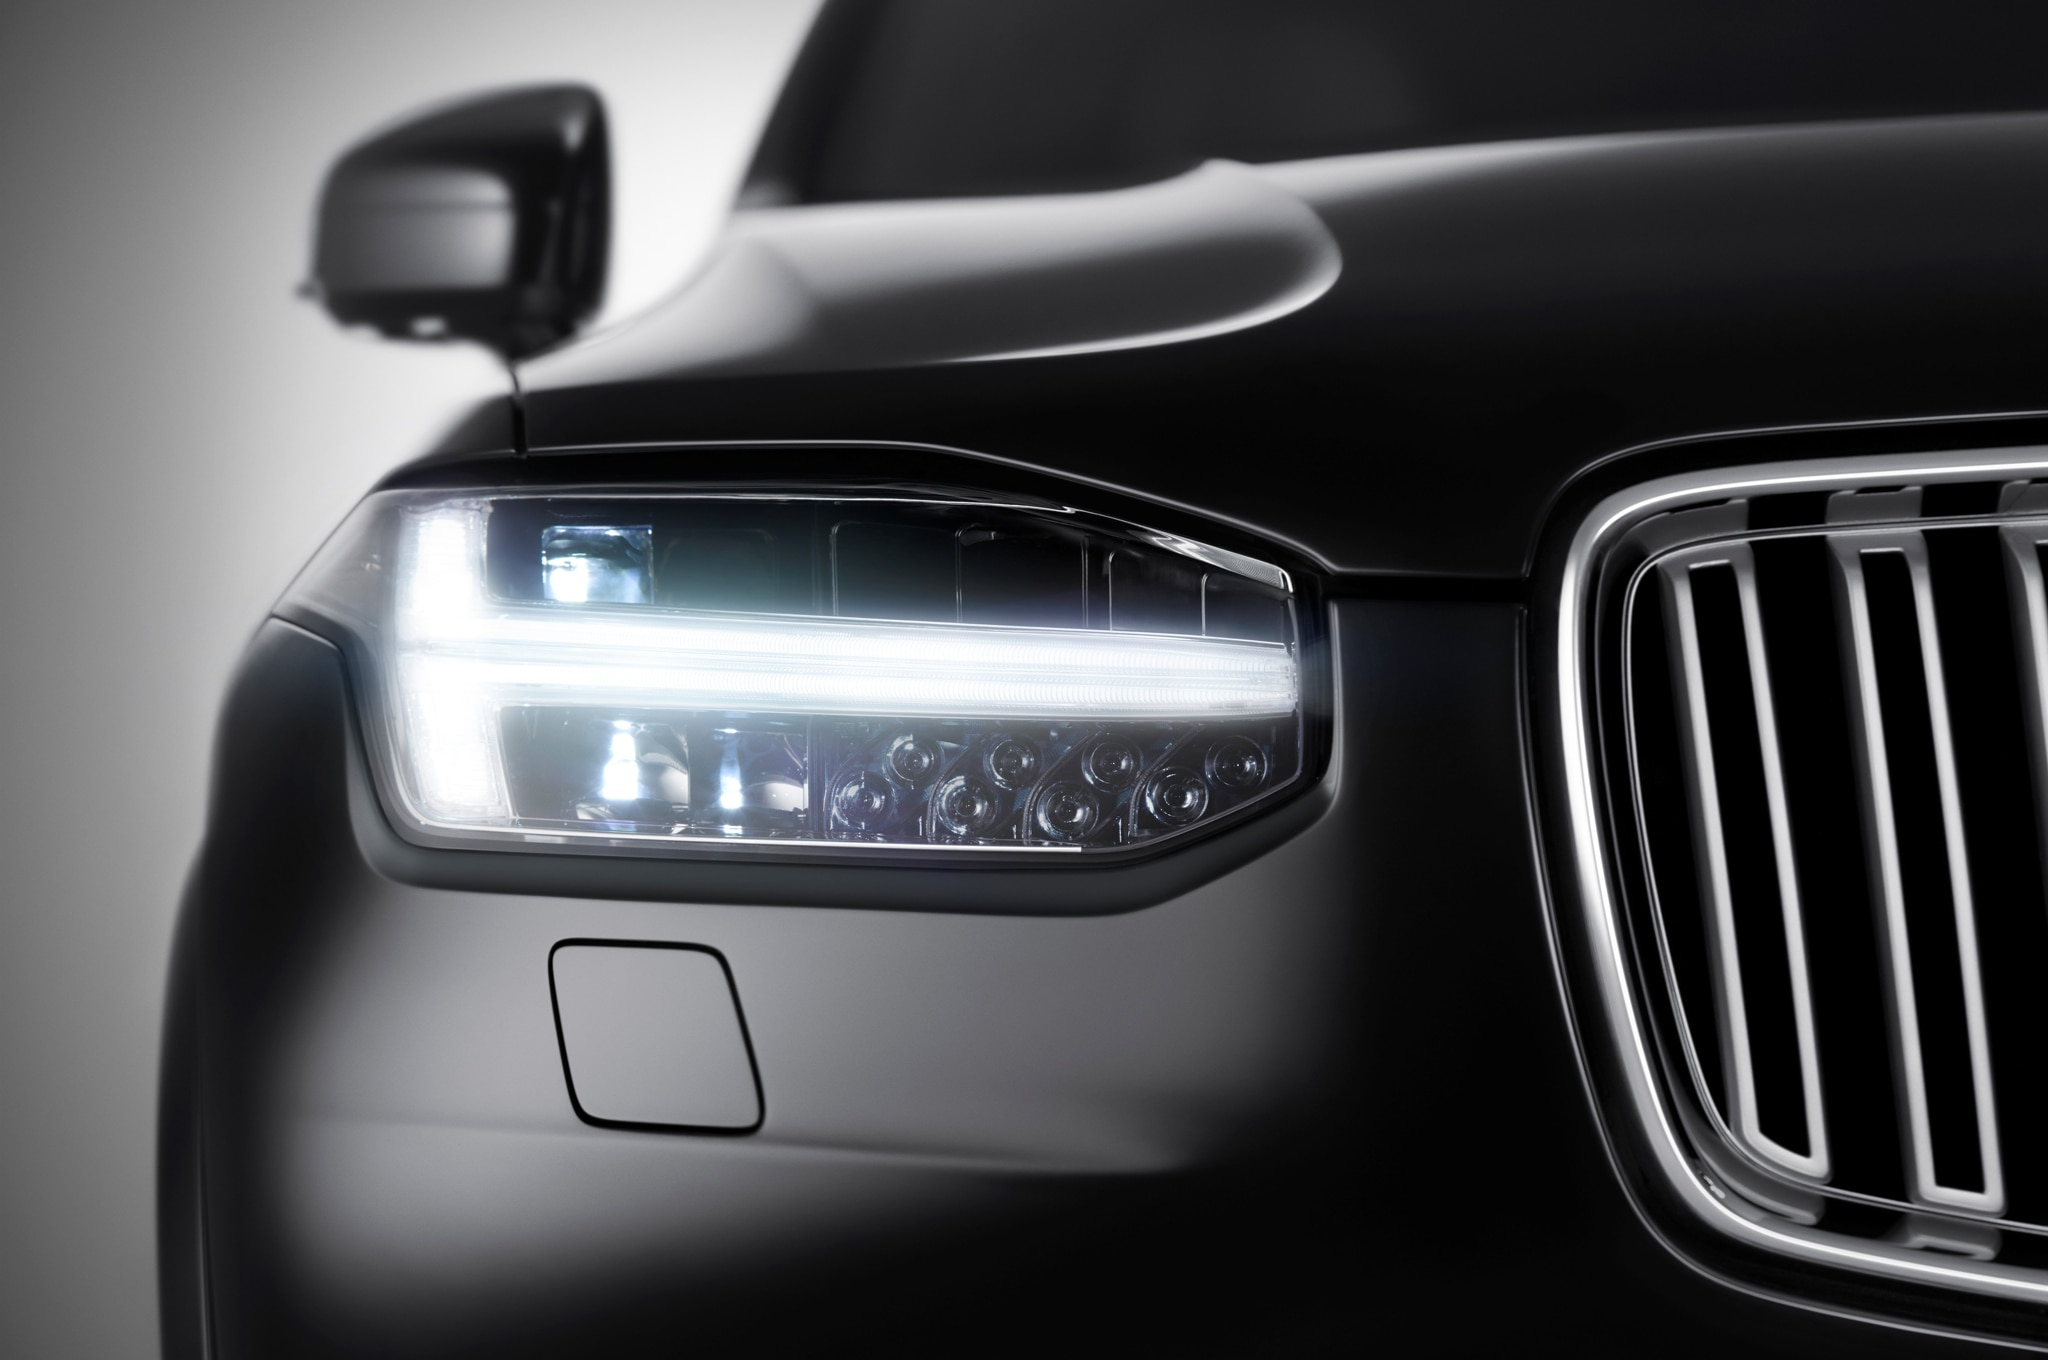 2015 Volvo Xc90 Thrors Hammer Running Lights1